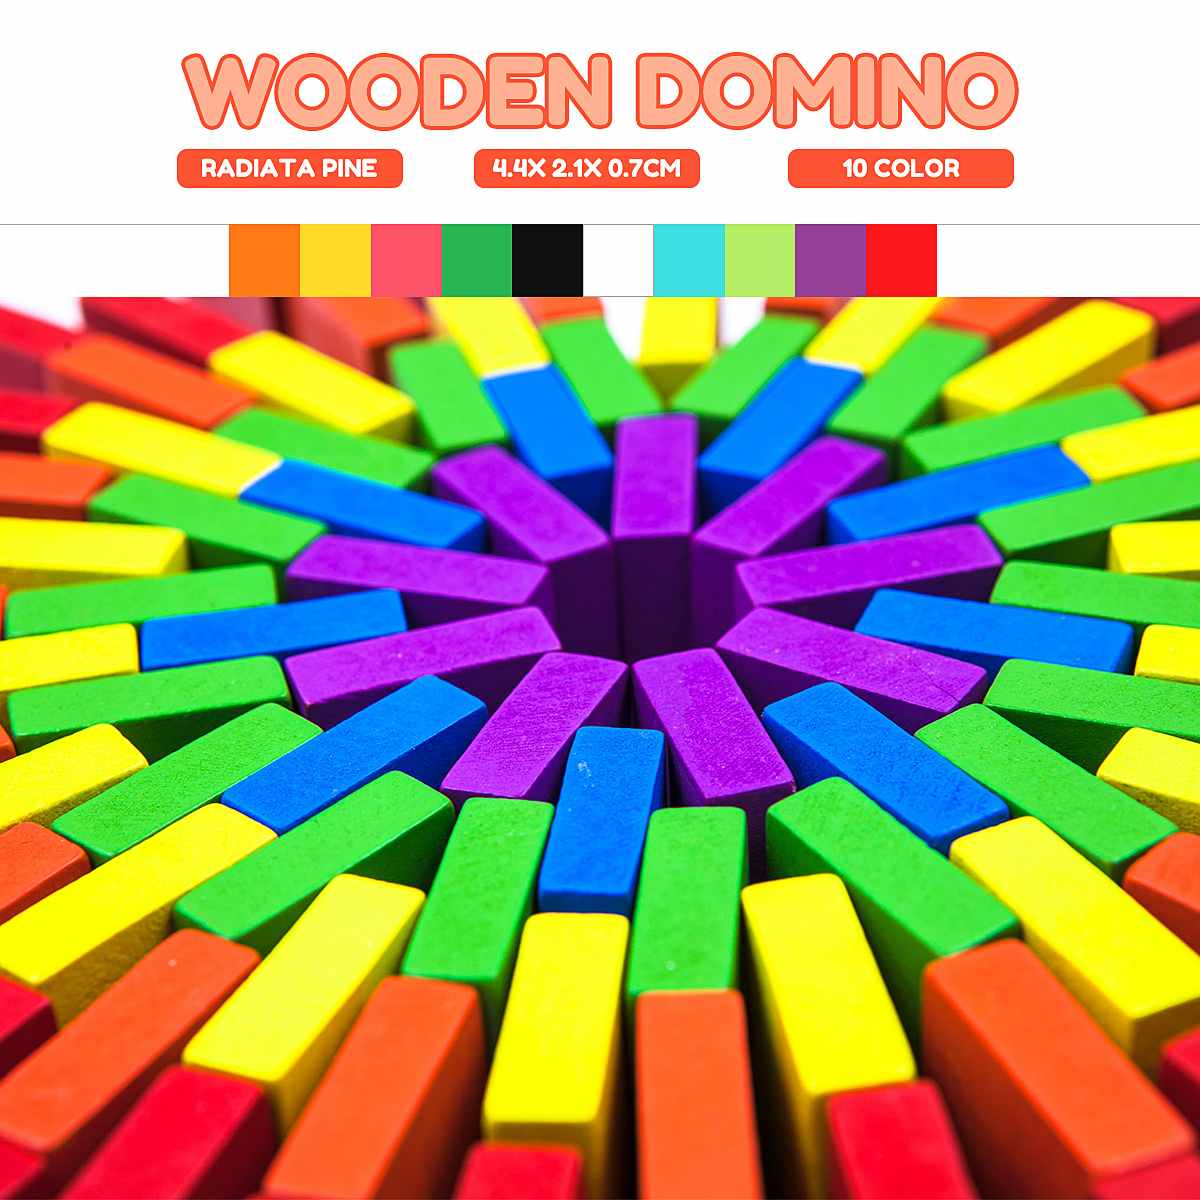 240pcs/set 10 colors Authentic Standard Wooden Children Kids Domino Games Toys Building Blocks For Kids Toy